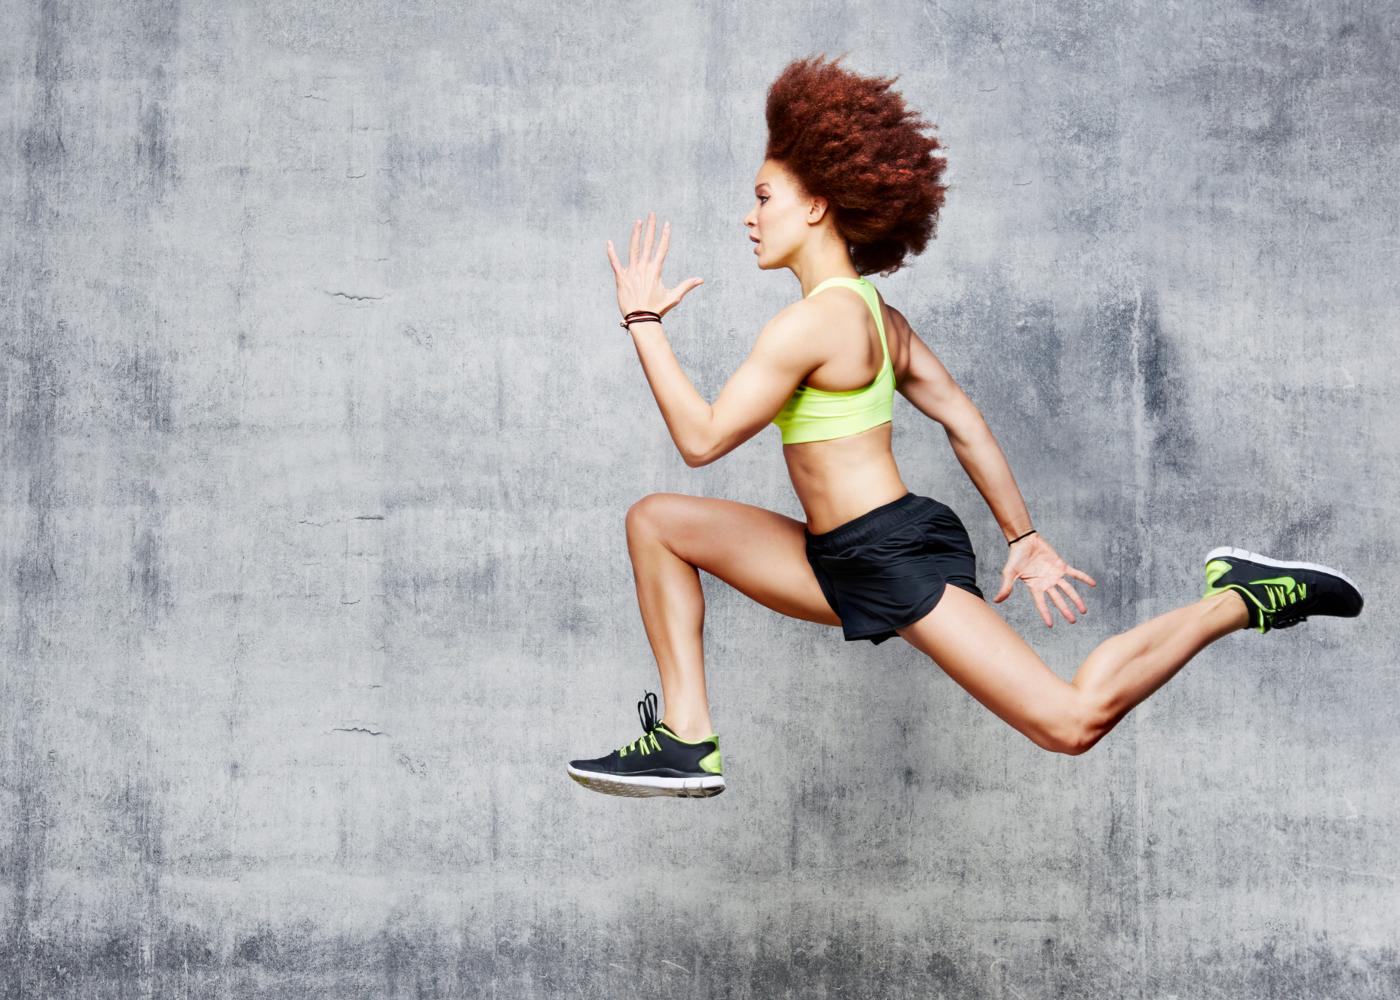 Mulher a correr com a técnica de corrida saltada